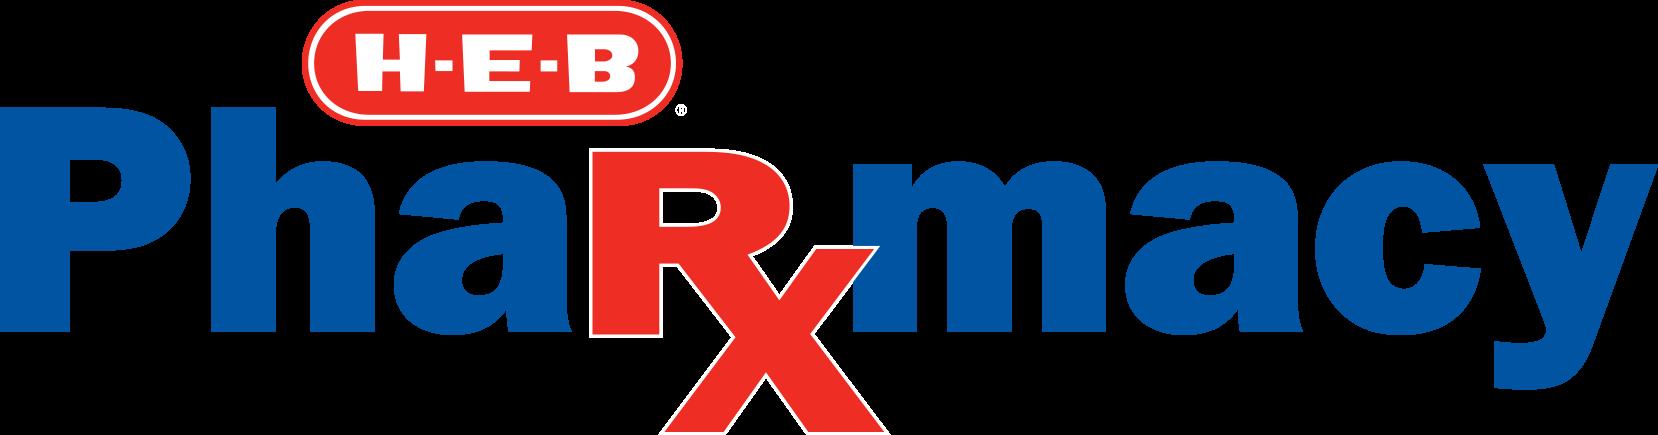 HEB Pharmacy Logo